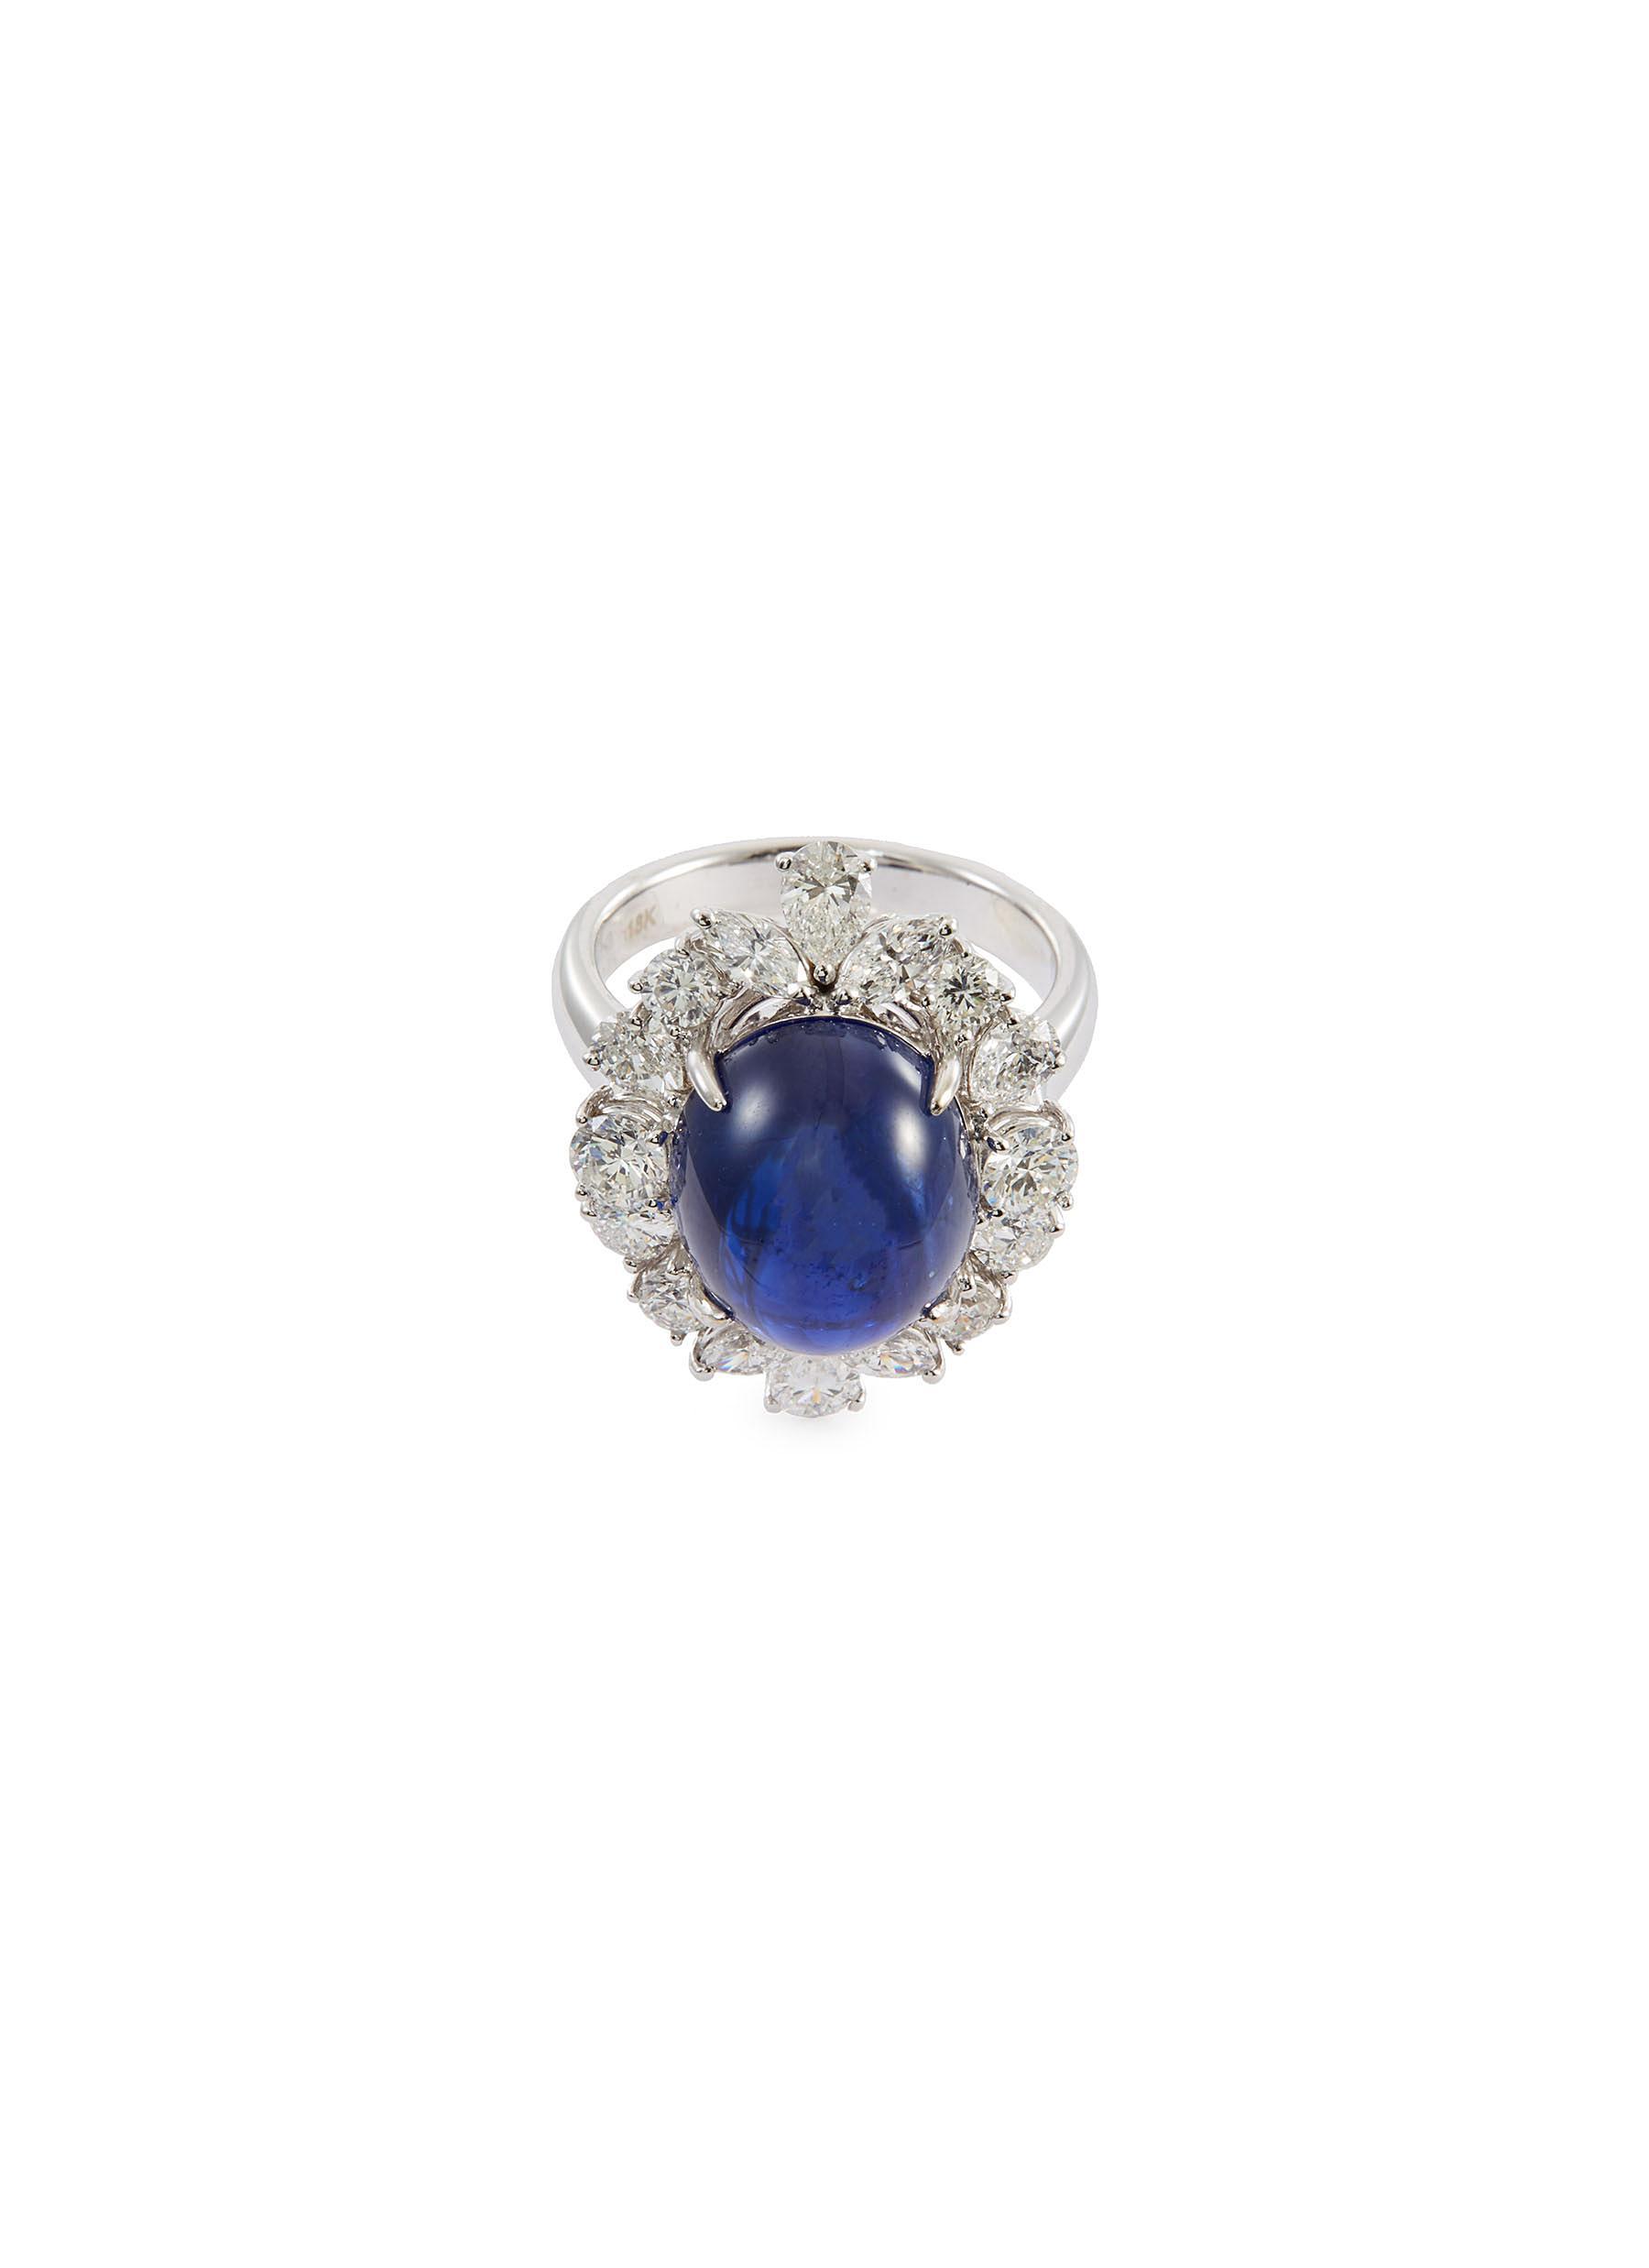 Diamond sapphire 18k white gold scalloped ring